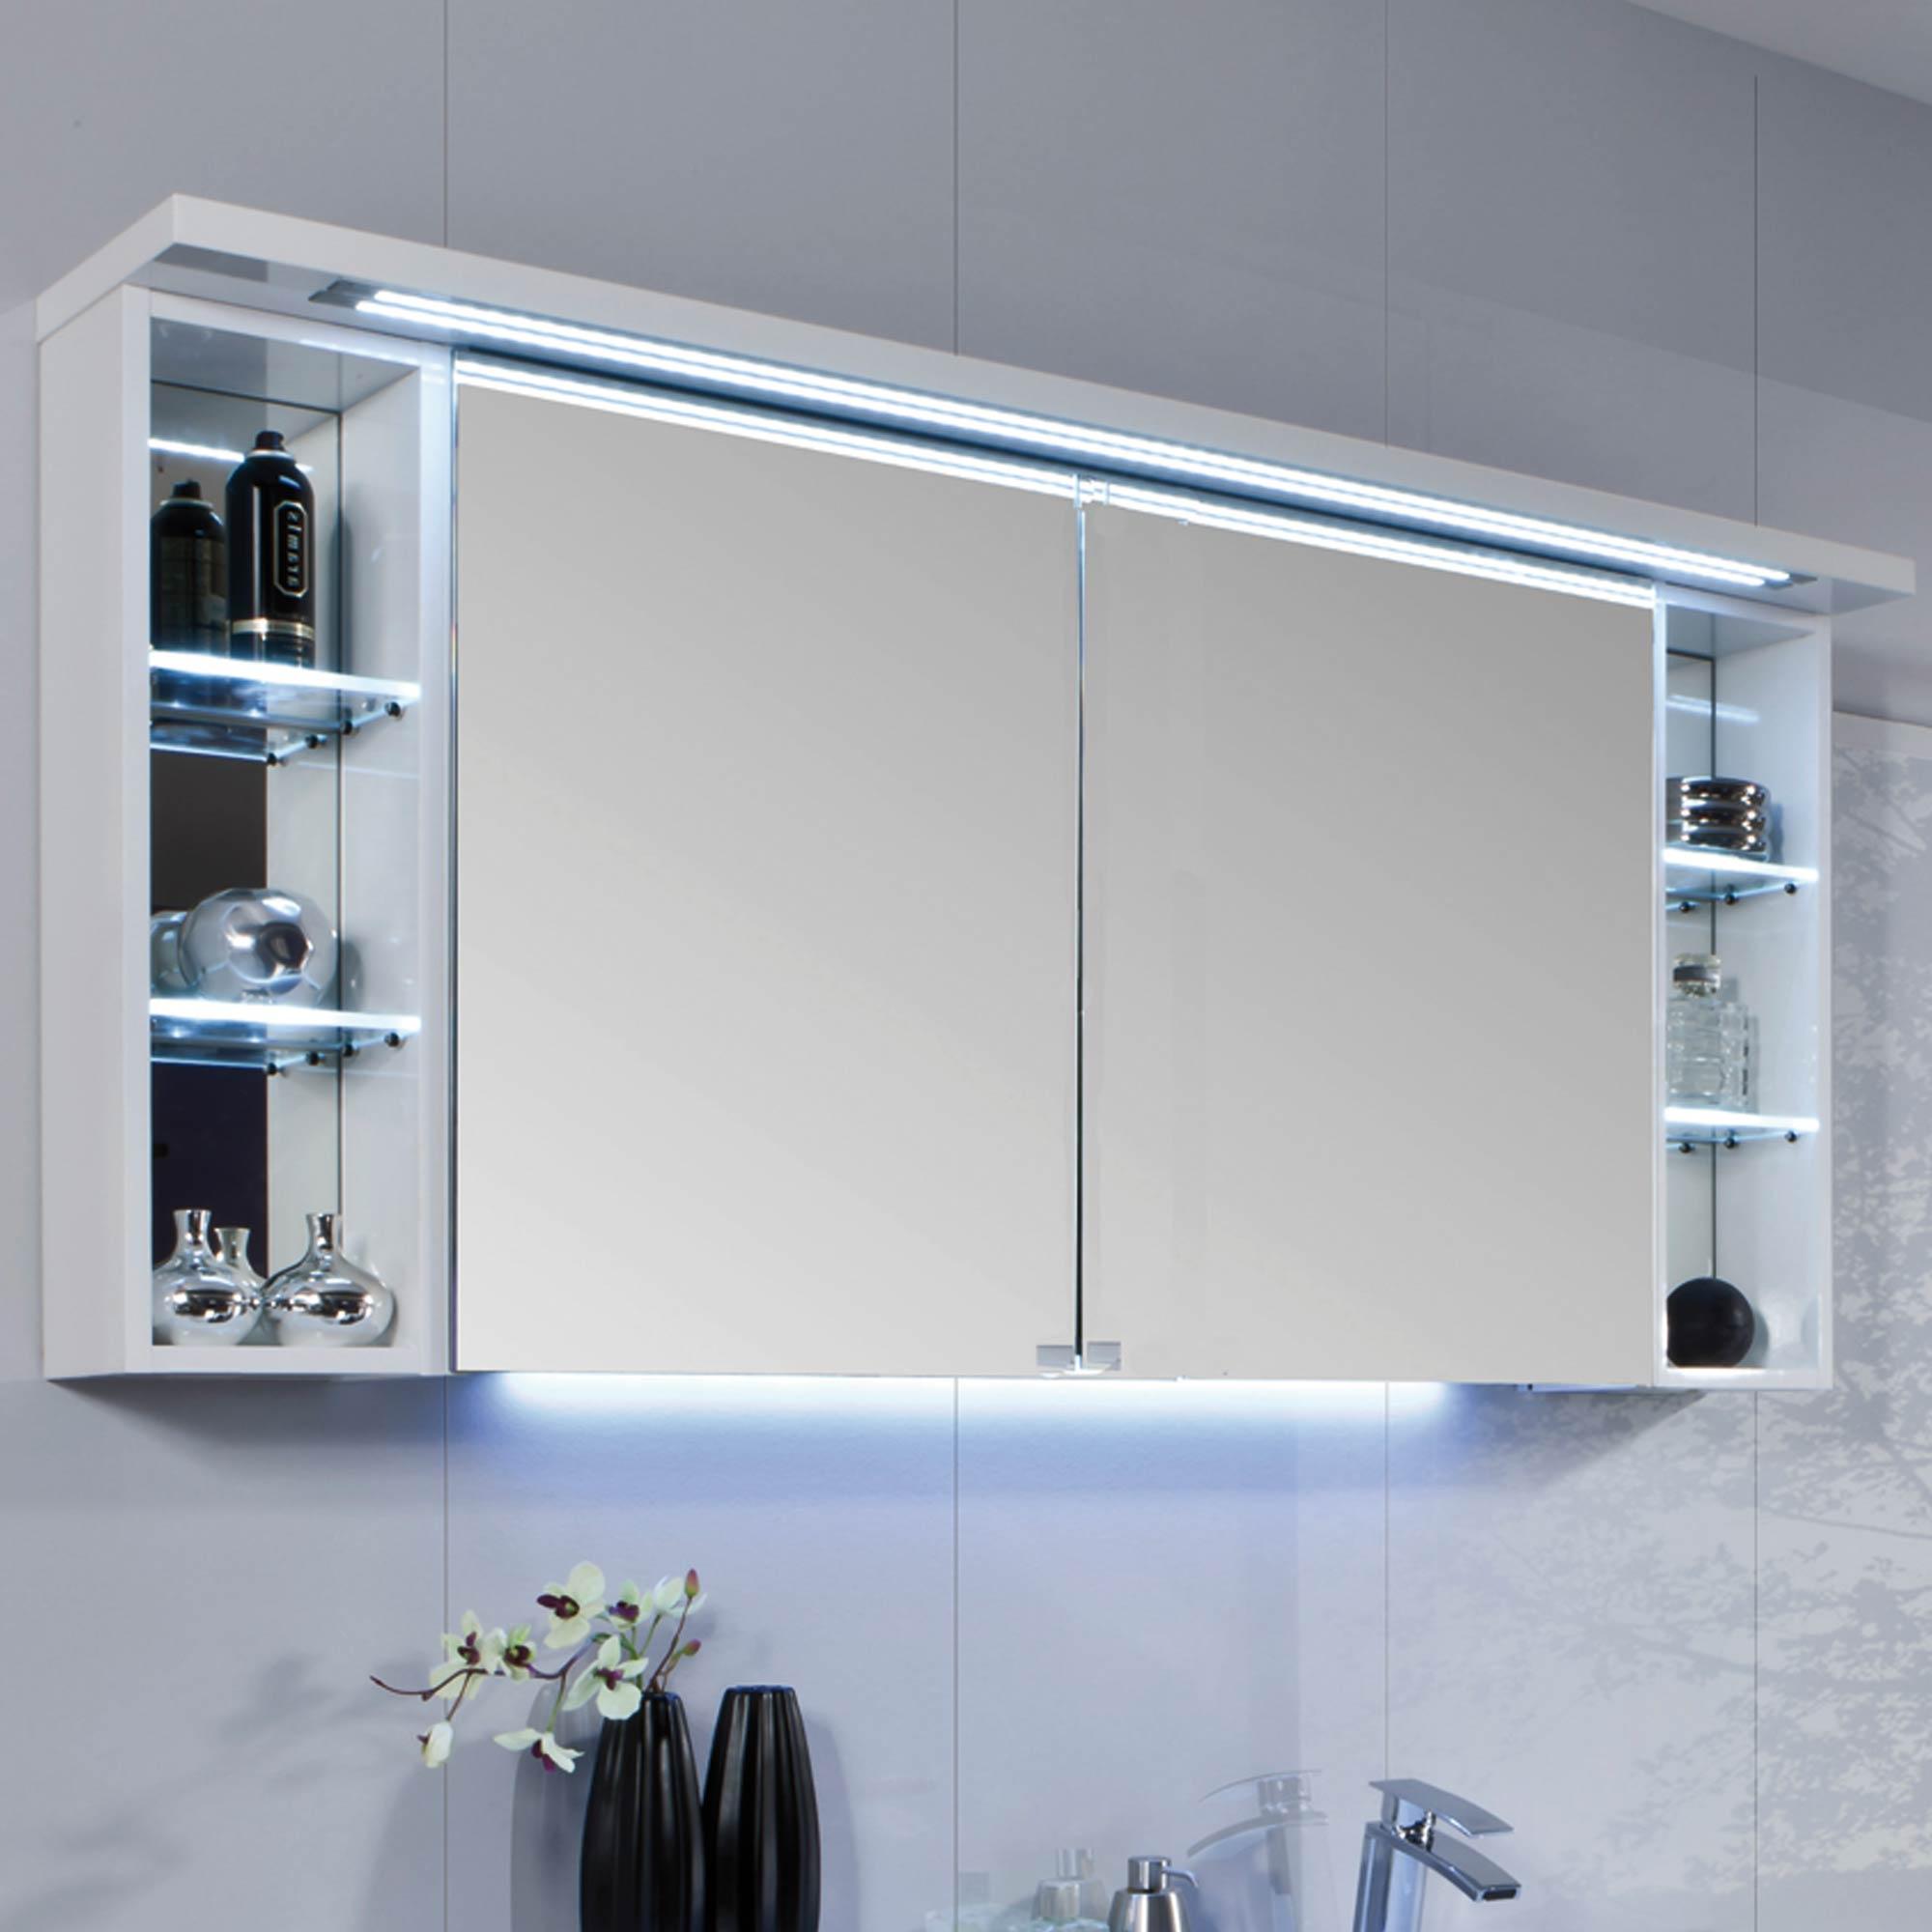 Spiegelschränke   Meubles de salle de bains, baignoires ...